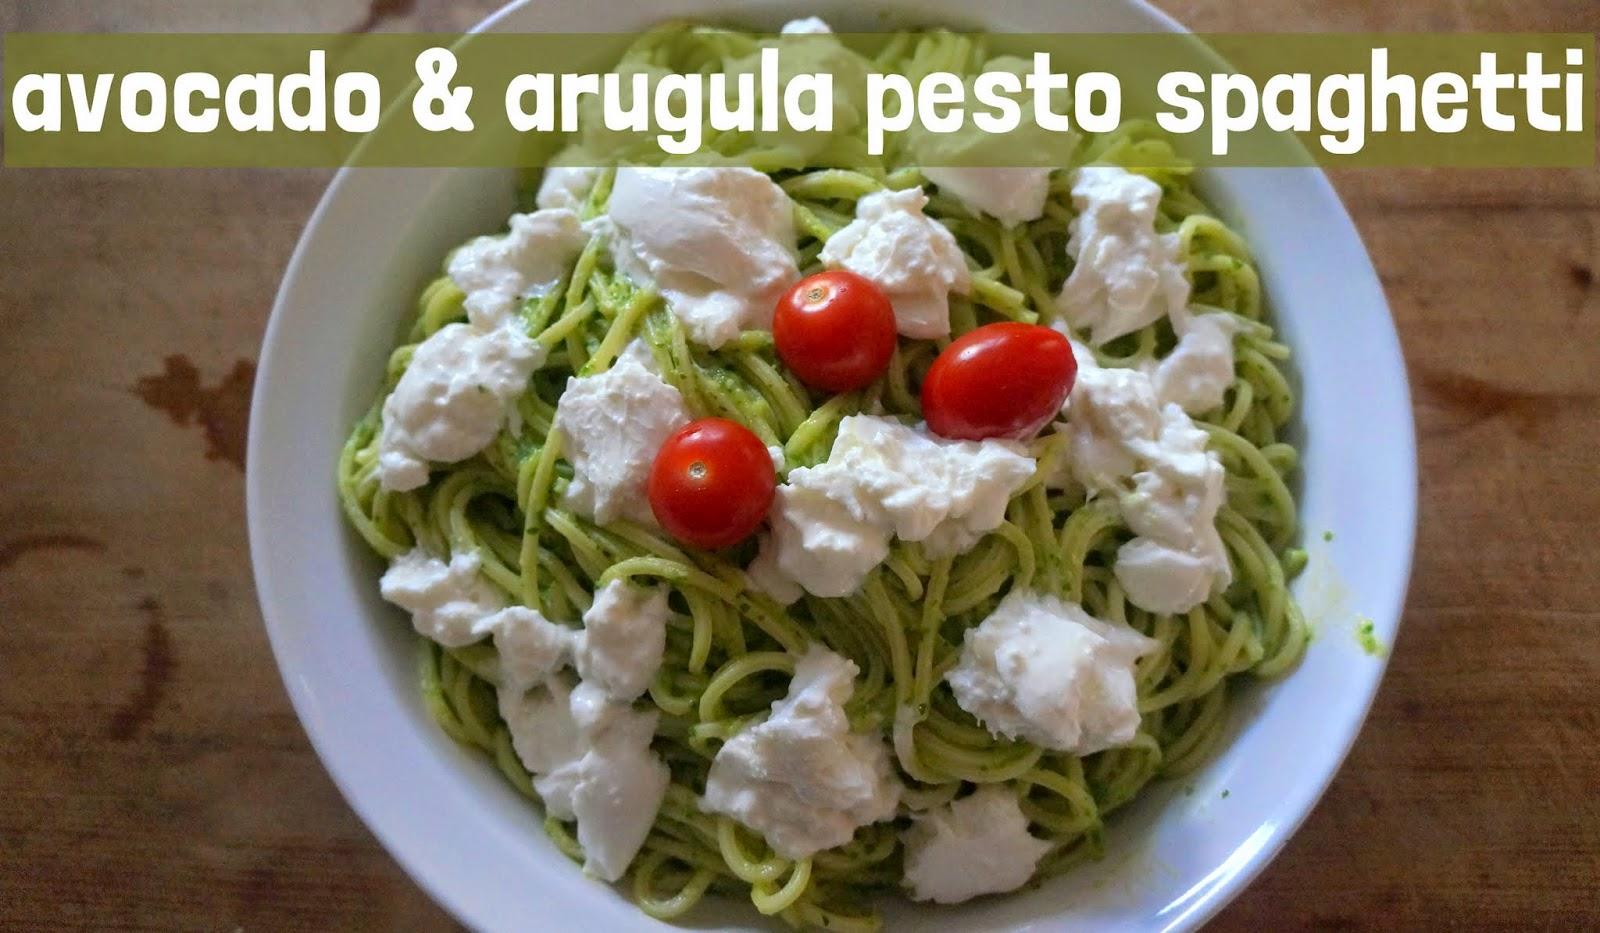 avocado & arugula pesto spaghetti